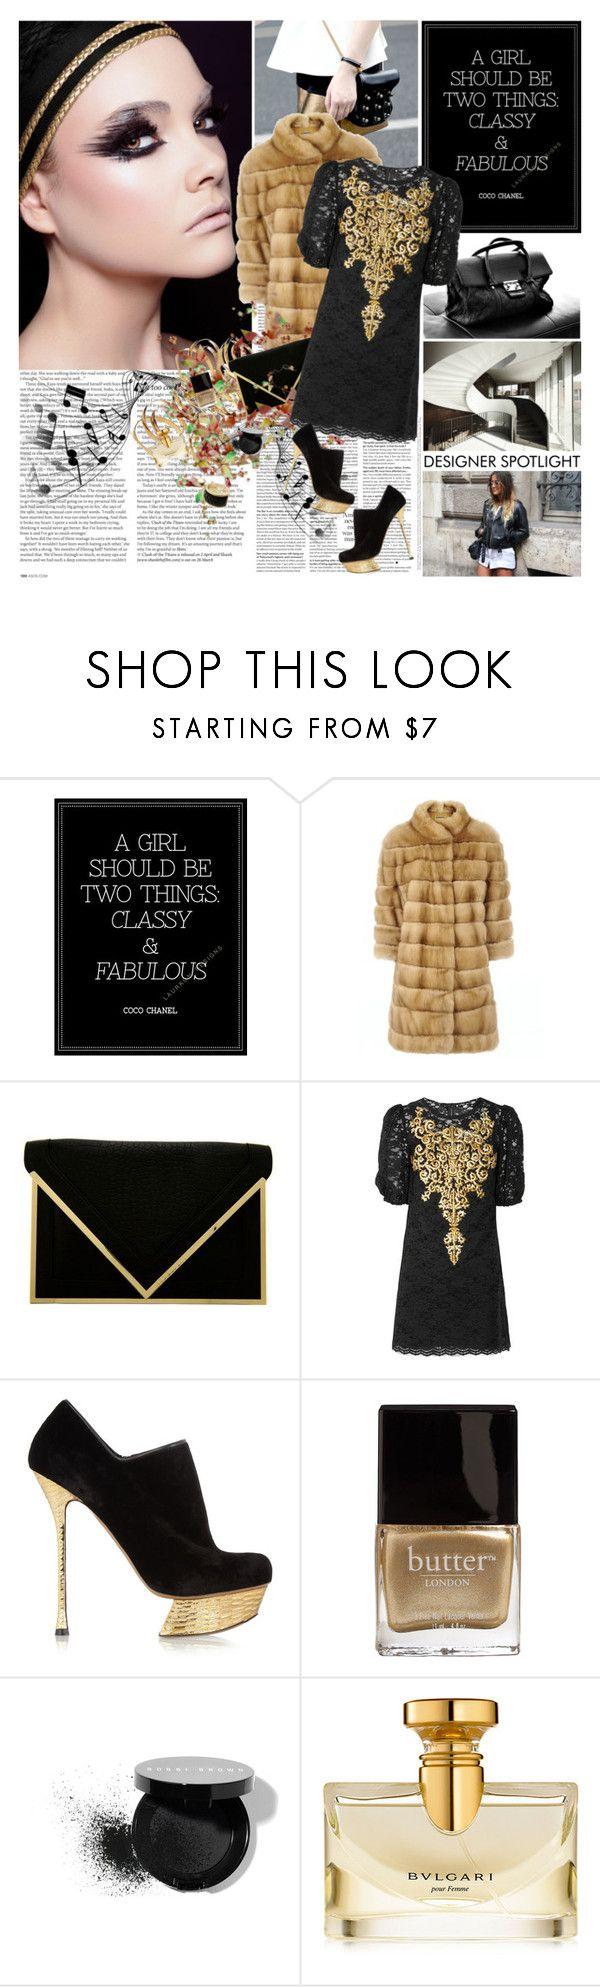 """TREND: GOLD and FUR"" by dani-elan ❤ liked on Polyvore featuring ASOS, Chanel, Armani Exchange, Dolce&Gabbana, Nicholas Kirkwood, Butter London, Bobbi Brown Cosmetics and Bulgari"